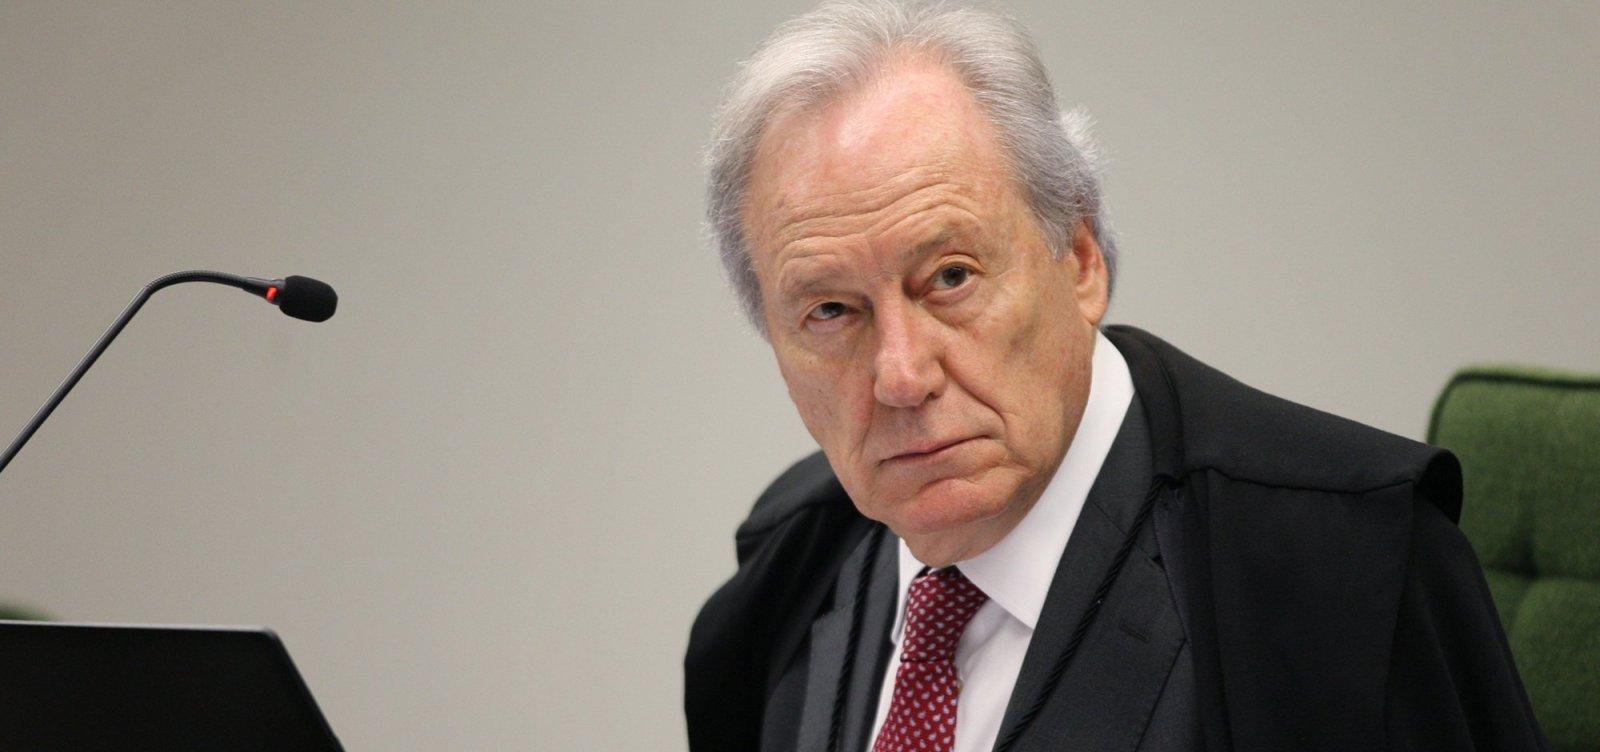 [Lewandowski libera habeas corpus de Lula para julgamento no STF]